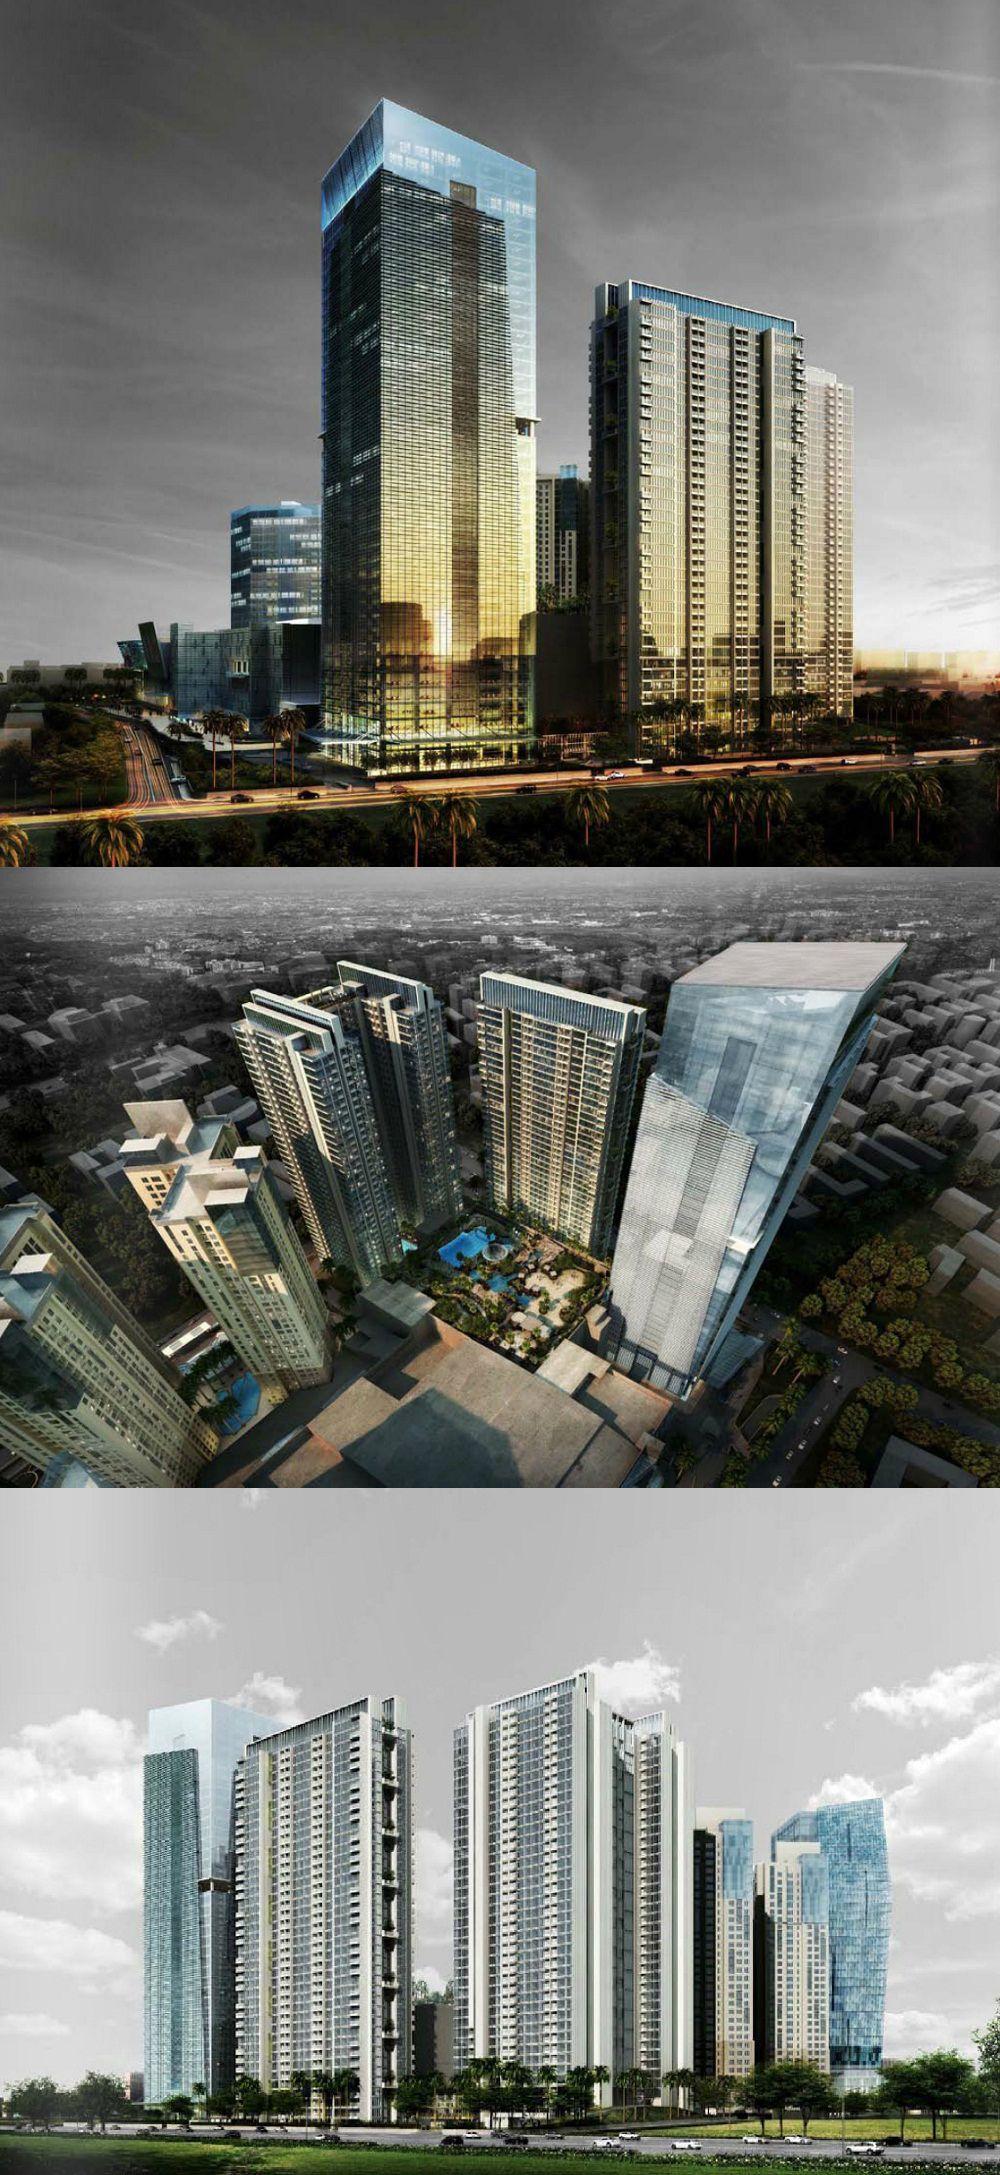 Kota Kasablanka phase 2 development in South Jakarta. Jakarta, Indonesia